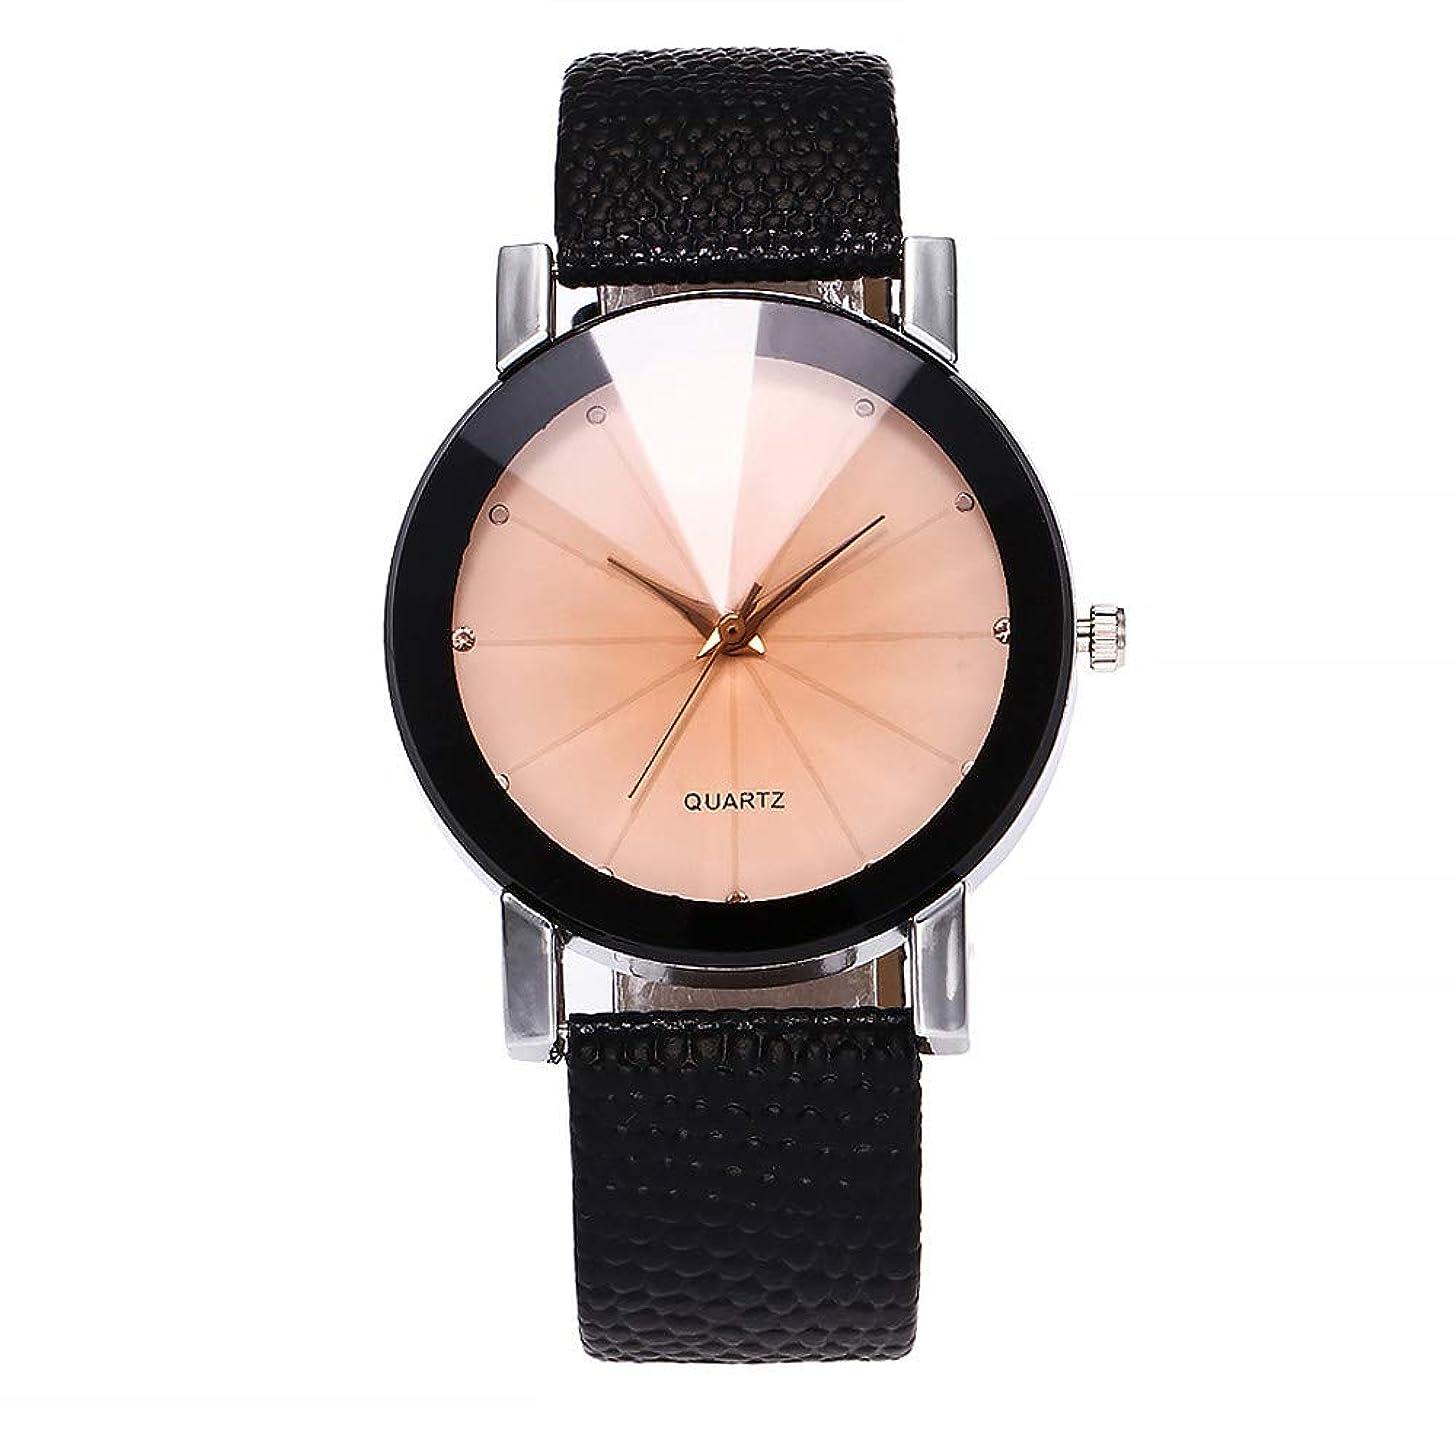 Wrist Watches for Women Under 5 ? vansvar Women's Casual Quartz Leather Band Newv Strap Watch Analog Wrist Watch